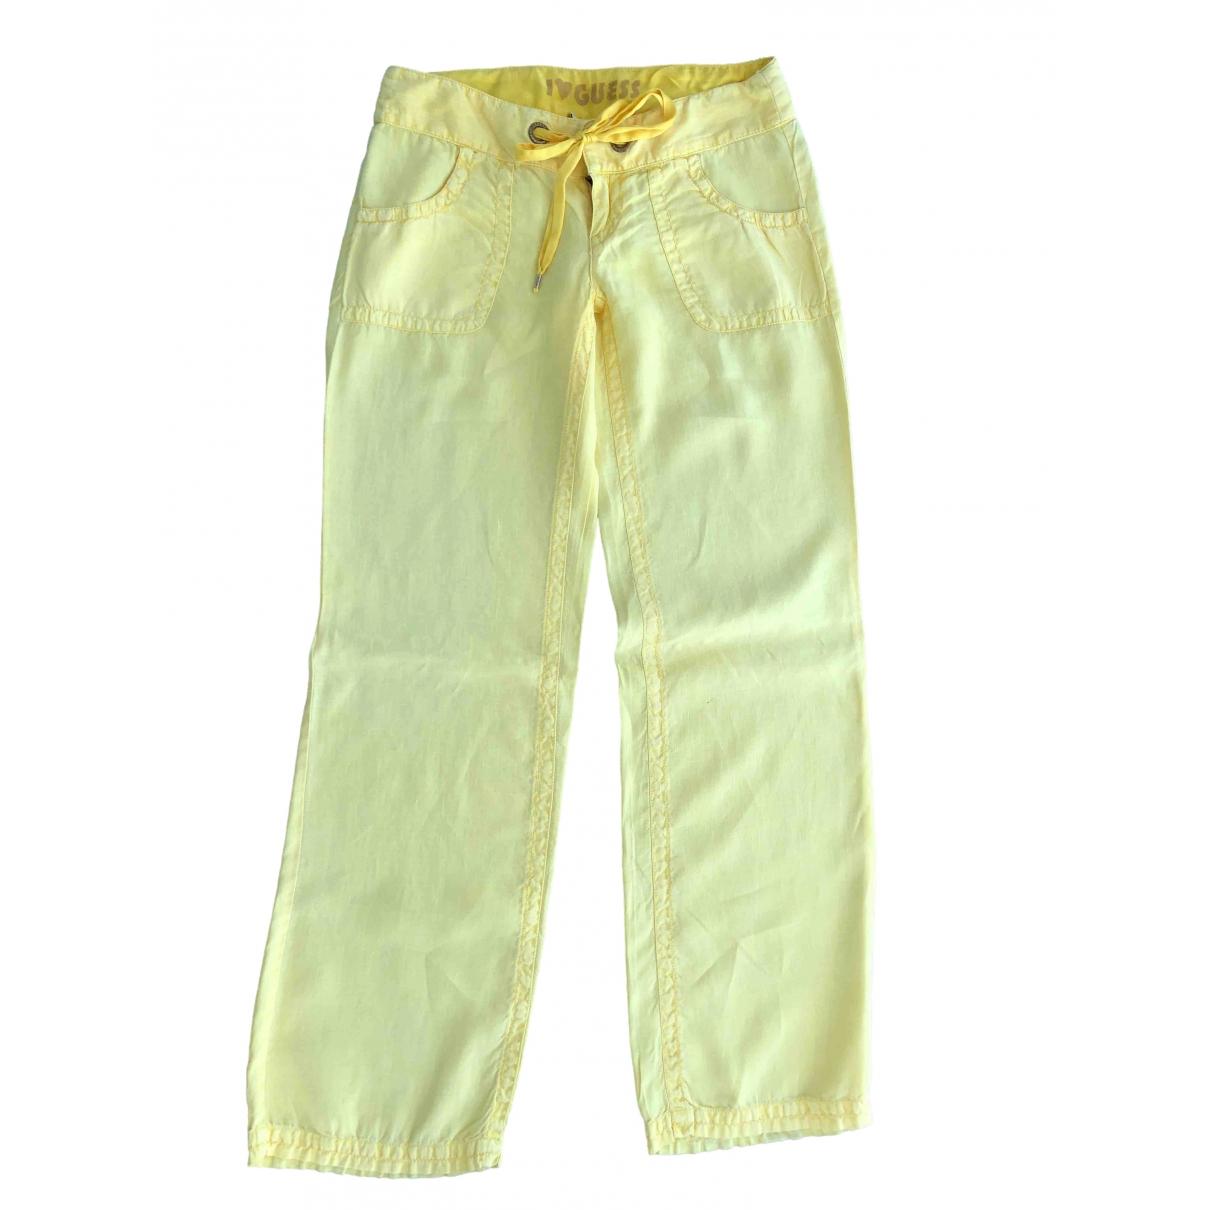 Guess \N Yellow Linen Trousers for Women M International